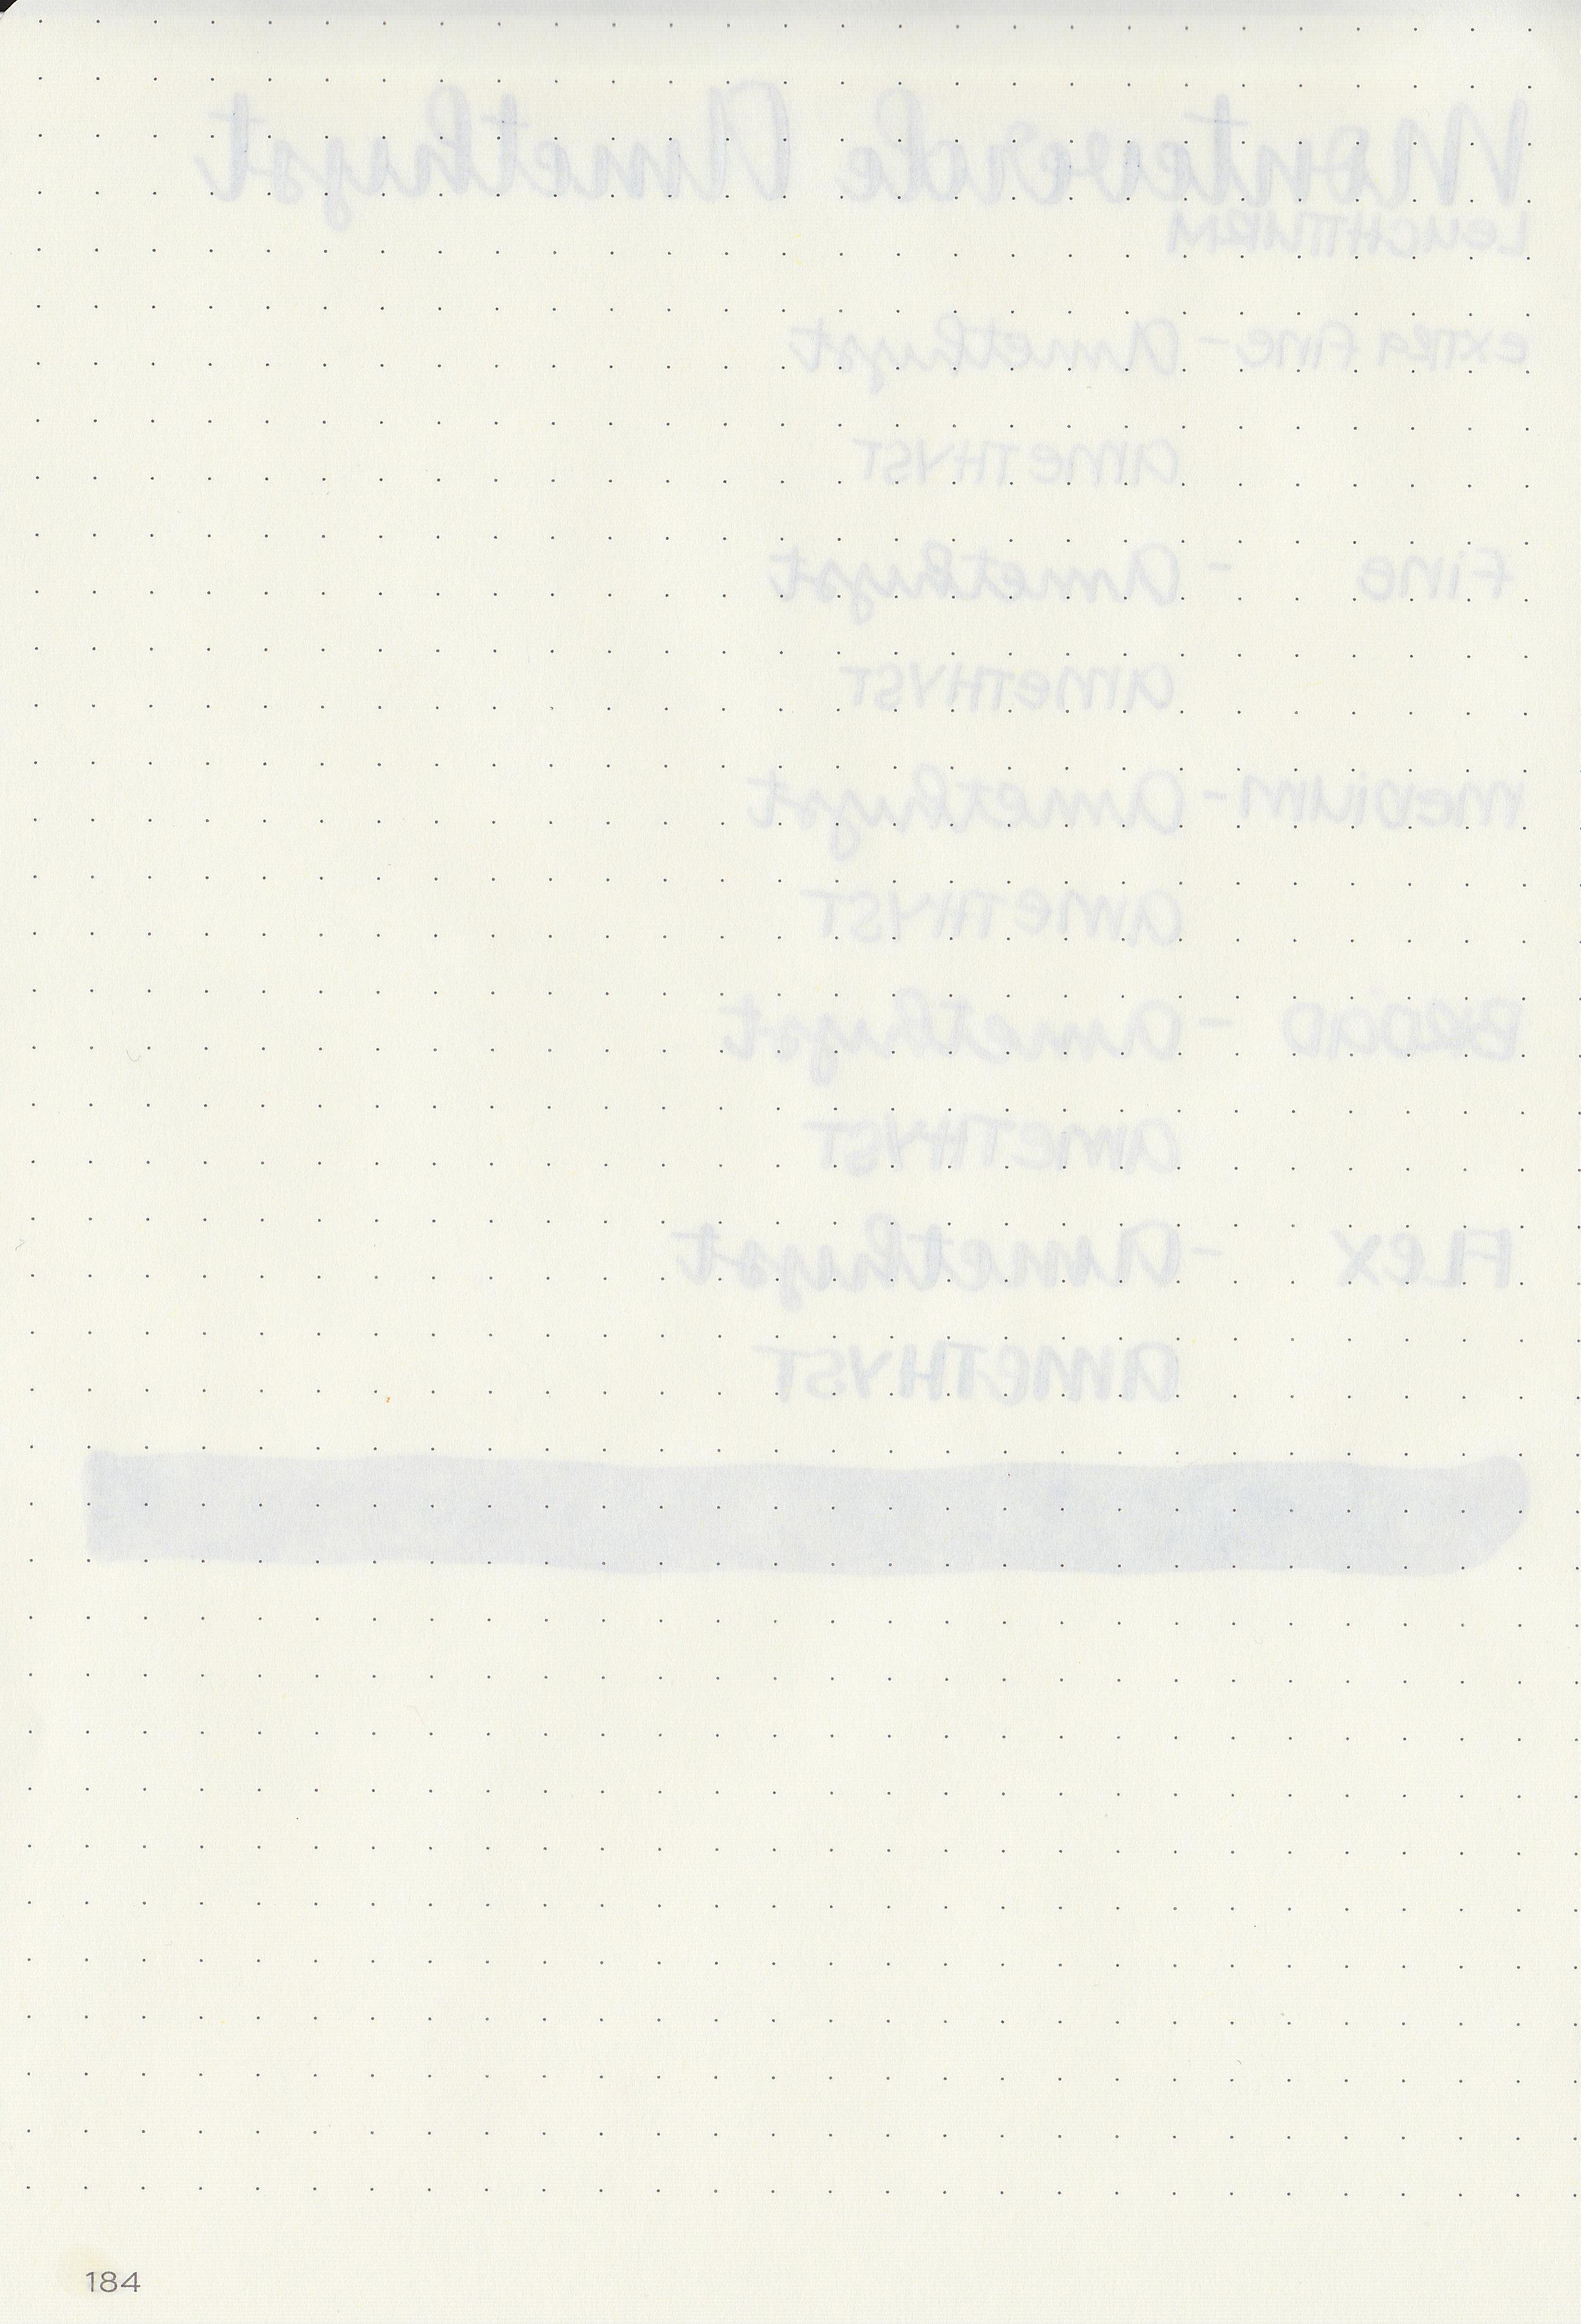 mv-amethyst-10.jpg